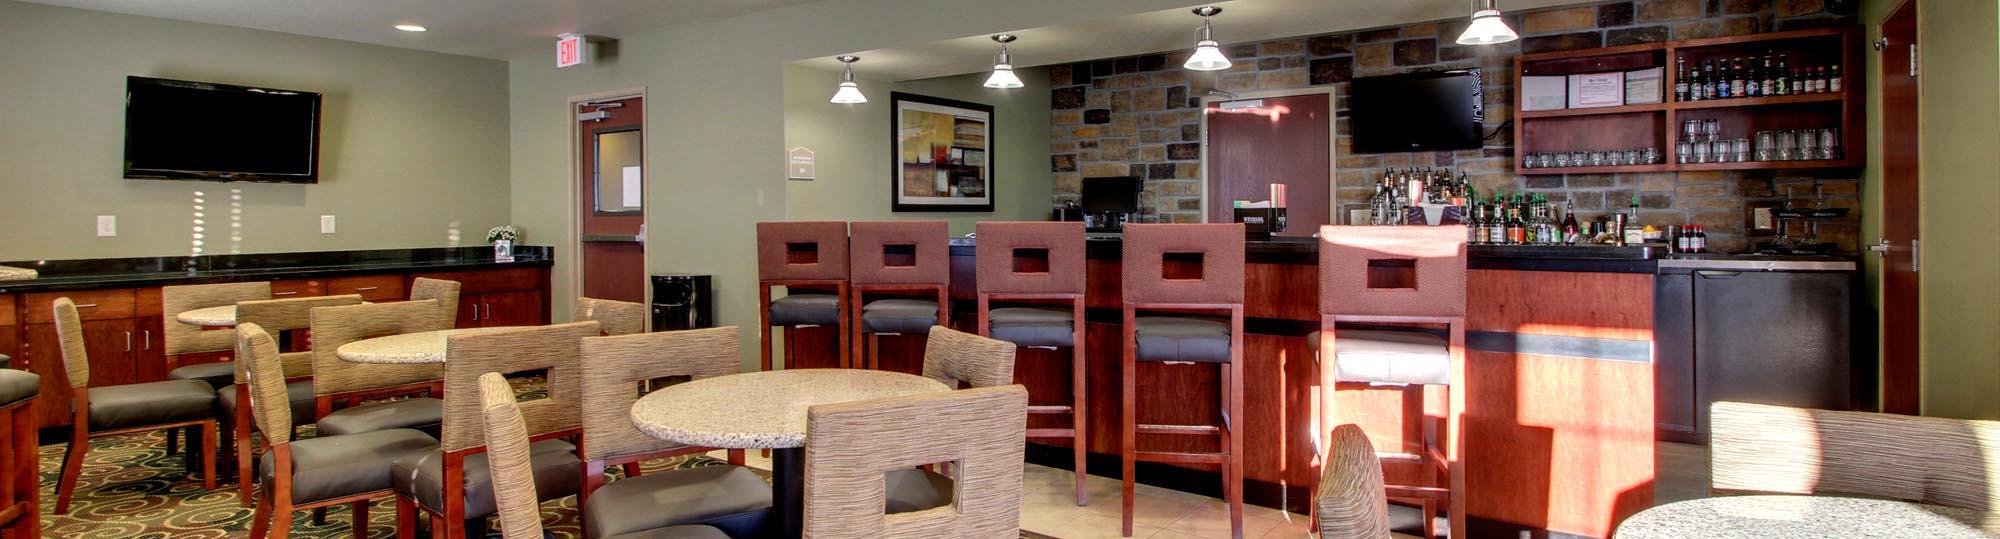 Cobblestone Inn & Suites Anthony